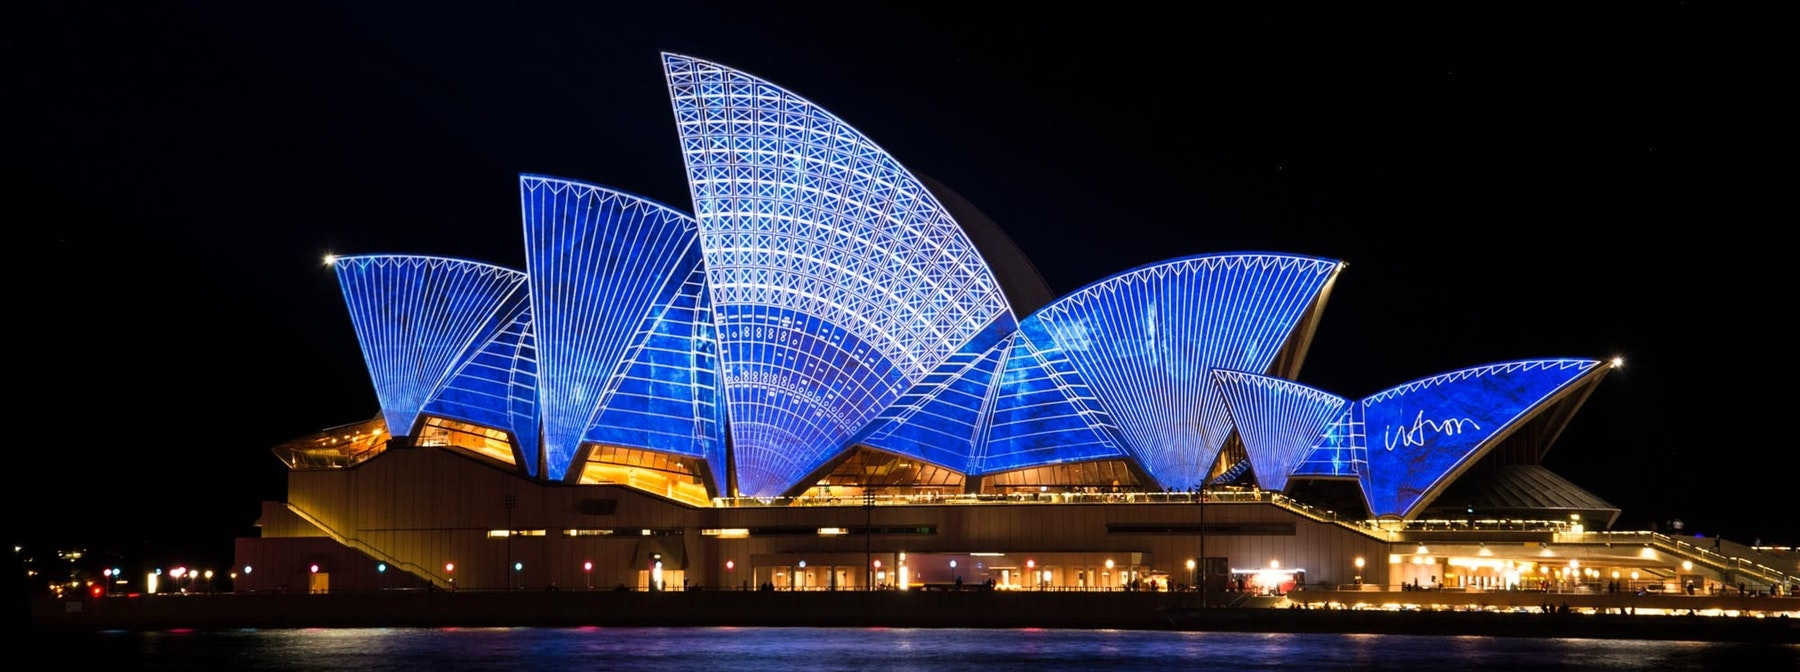 Sydney Opera House image for building LEGO architecture kits